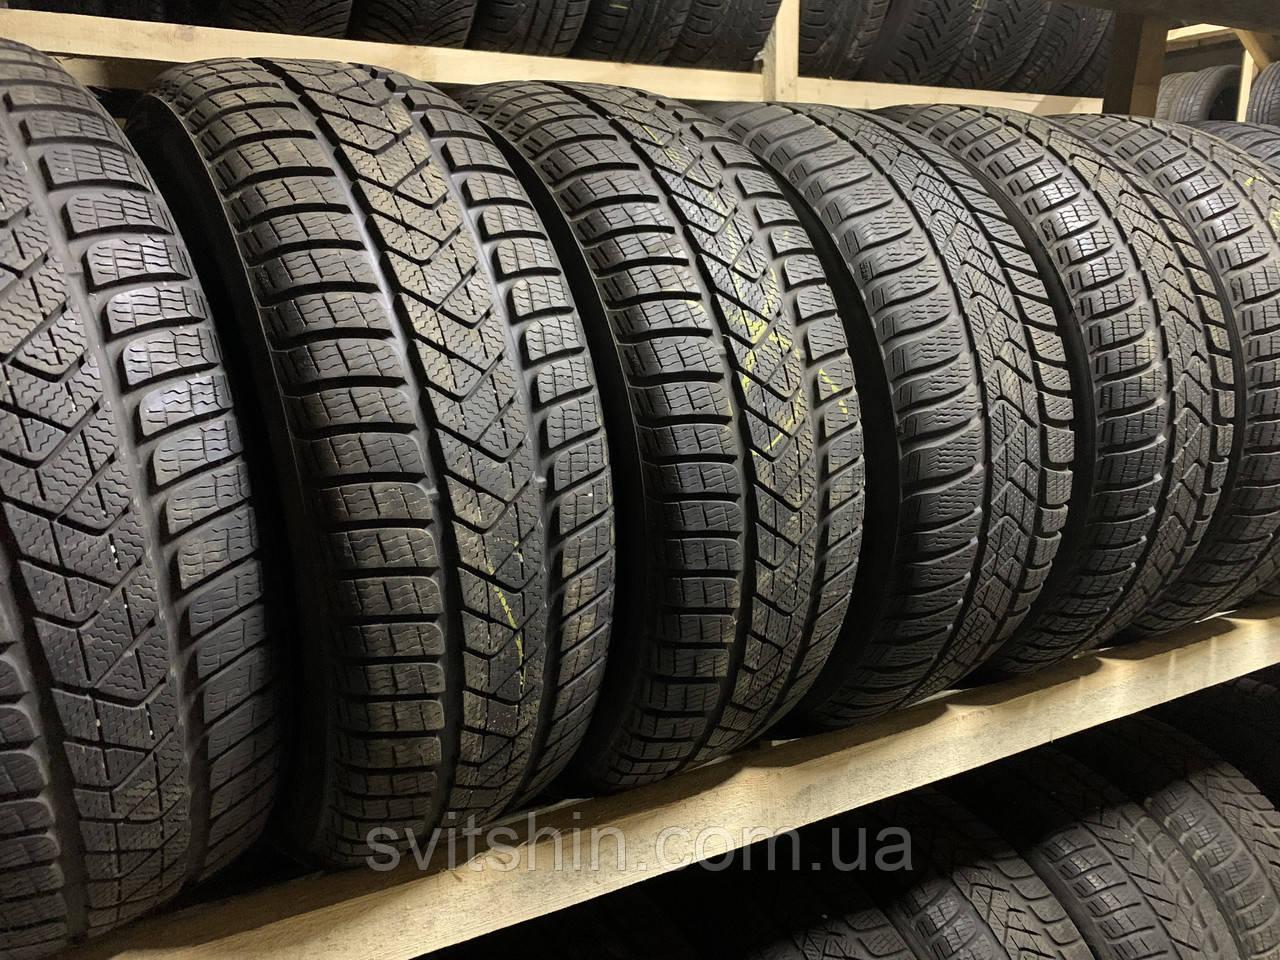 Зимові шини 215/60R16 Pirelli Sottozero 3 (7мм) за 1шт